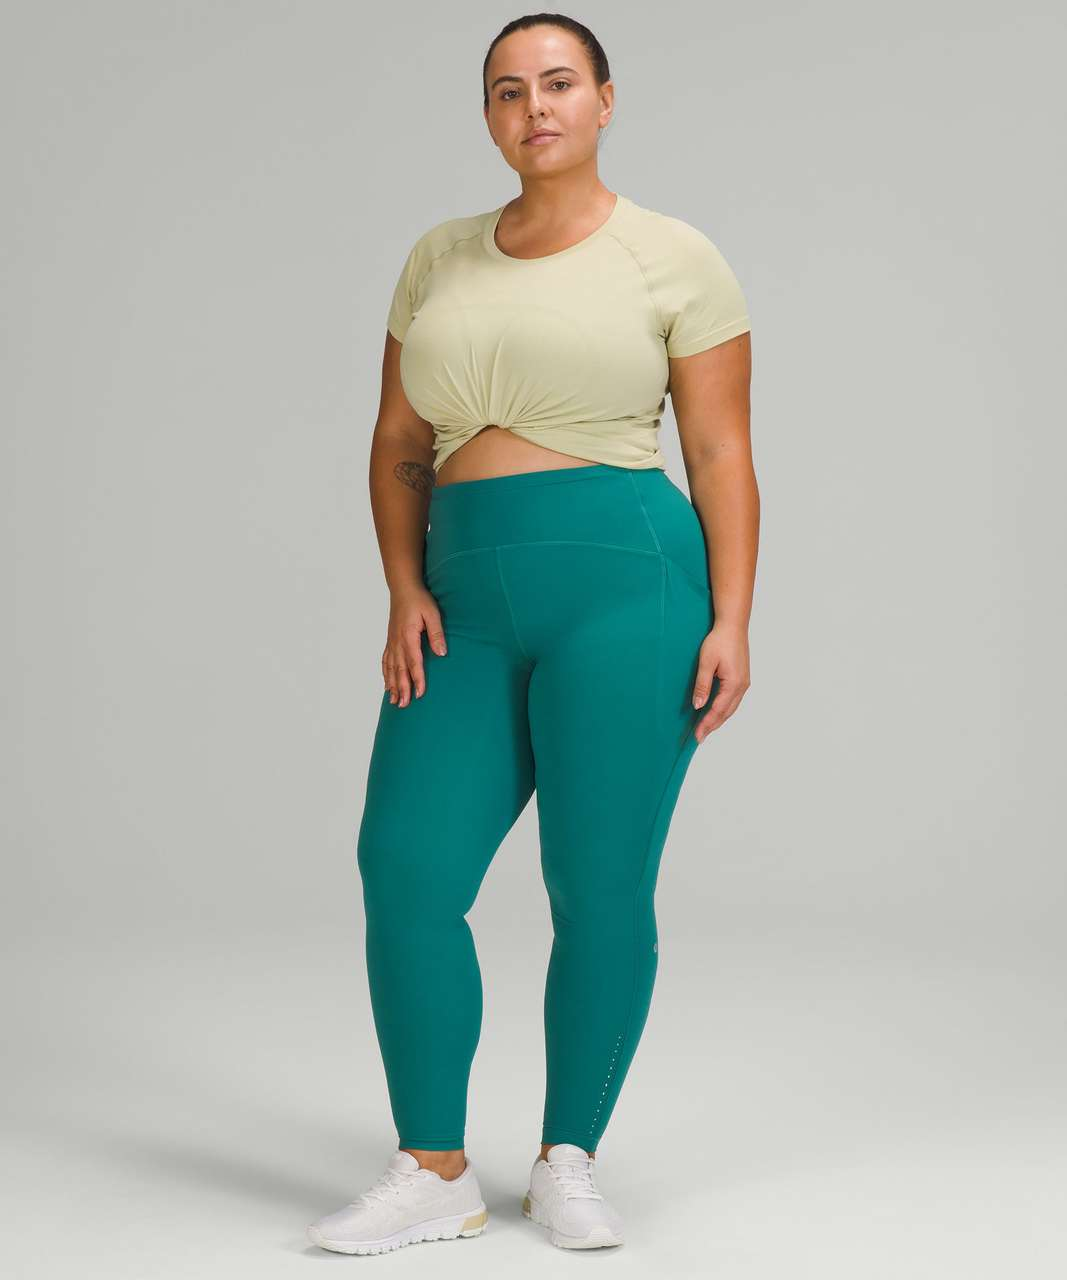 Lululemon Swiftly Tech Short Sleeve Shirt 2.0 - Dew Green / Dew Green